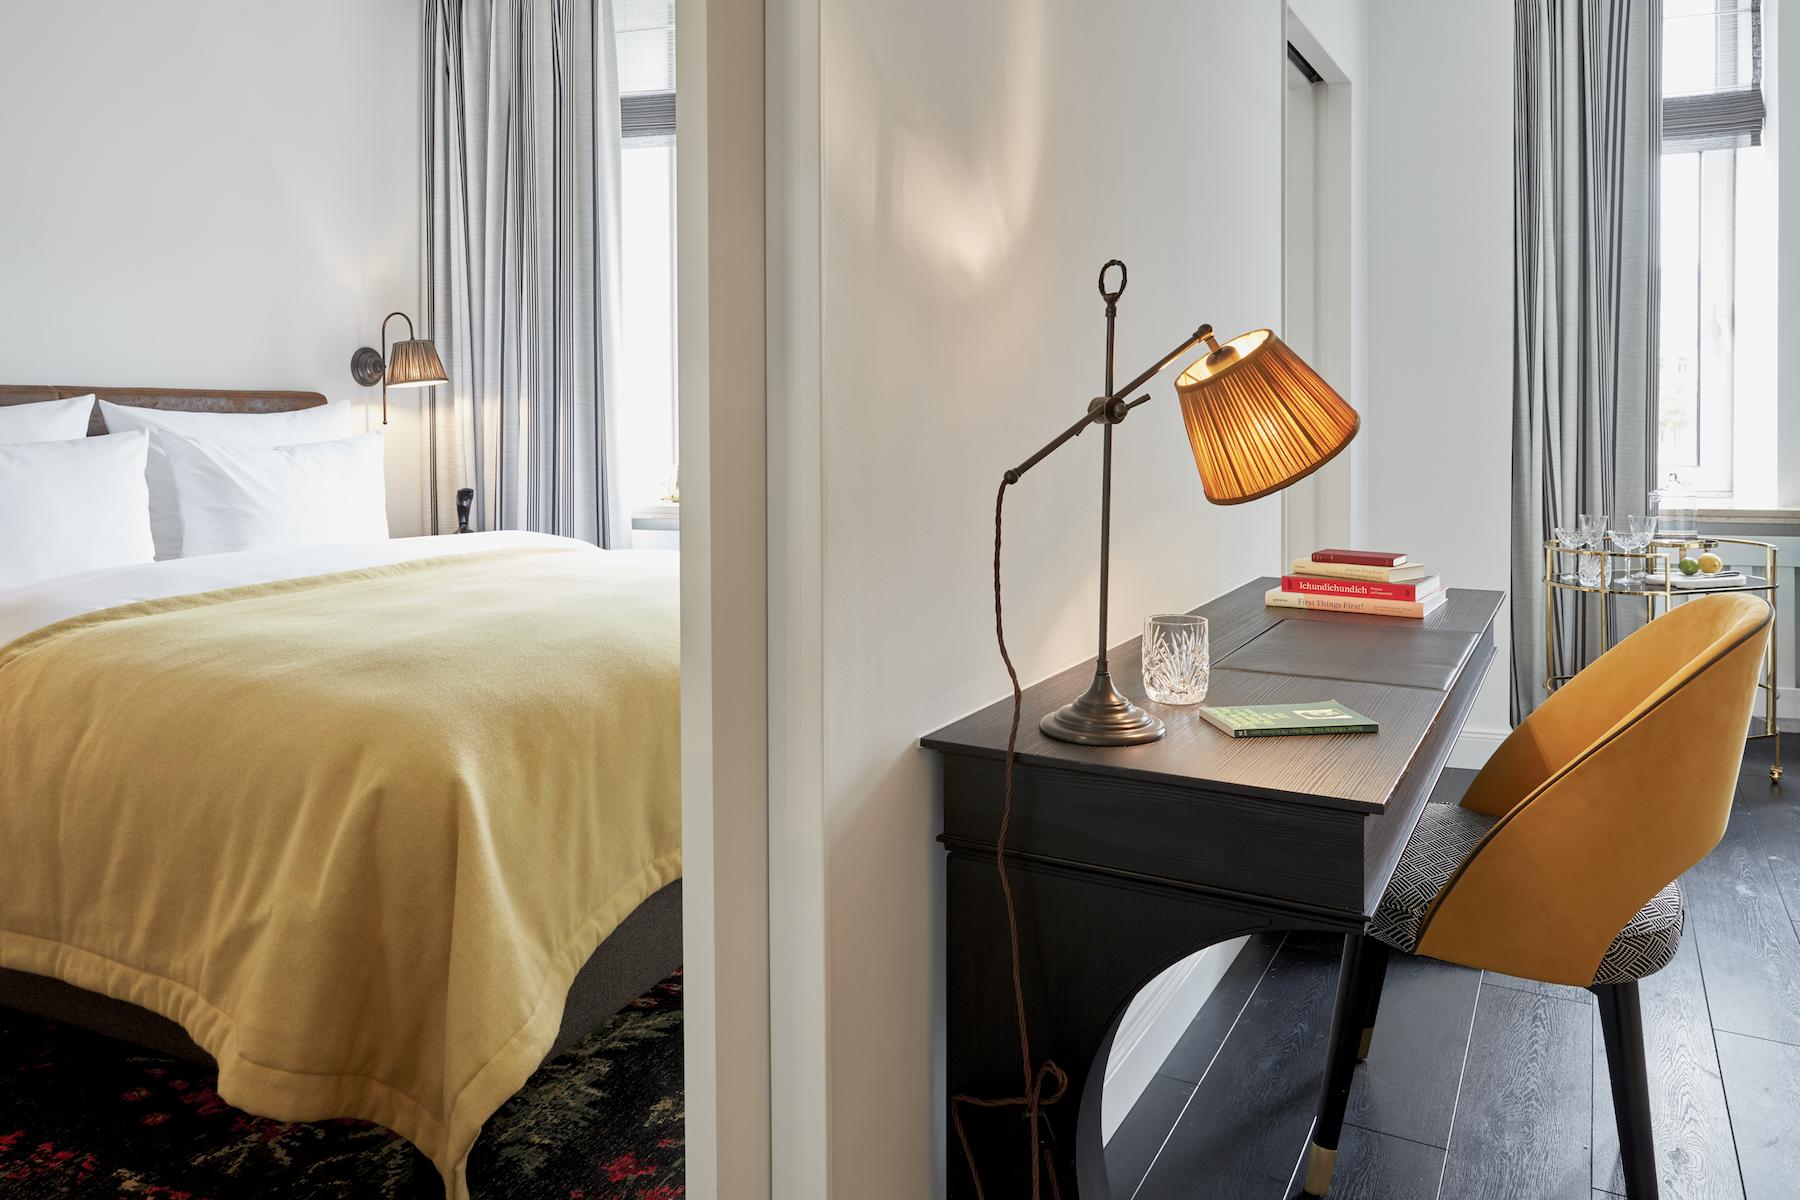 suelovesnyc_hamburg_hotel_guide_sir_nikolai_hotel_in_hamburg_zimmer